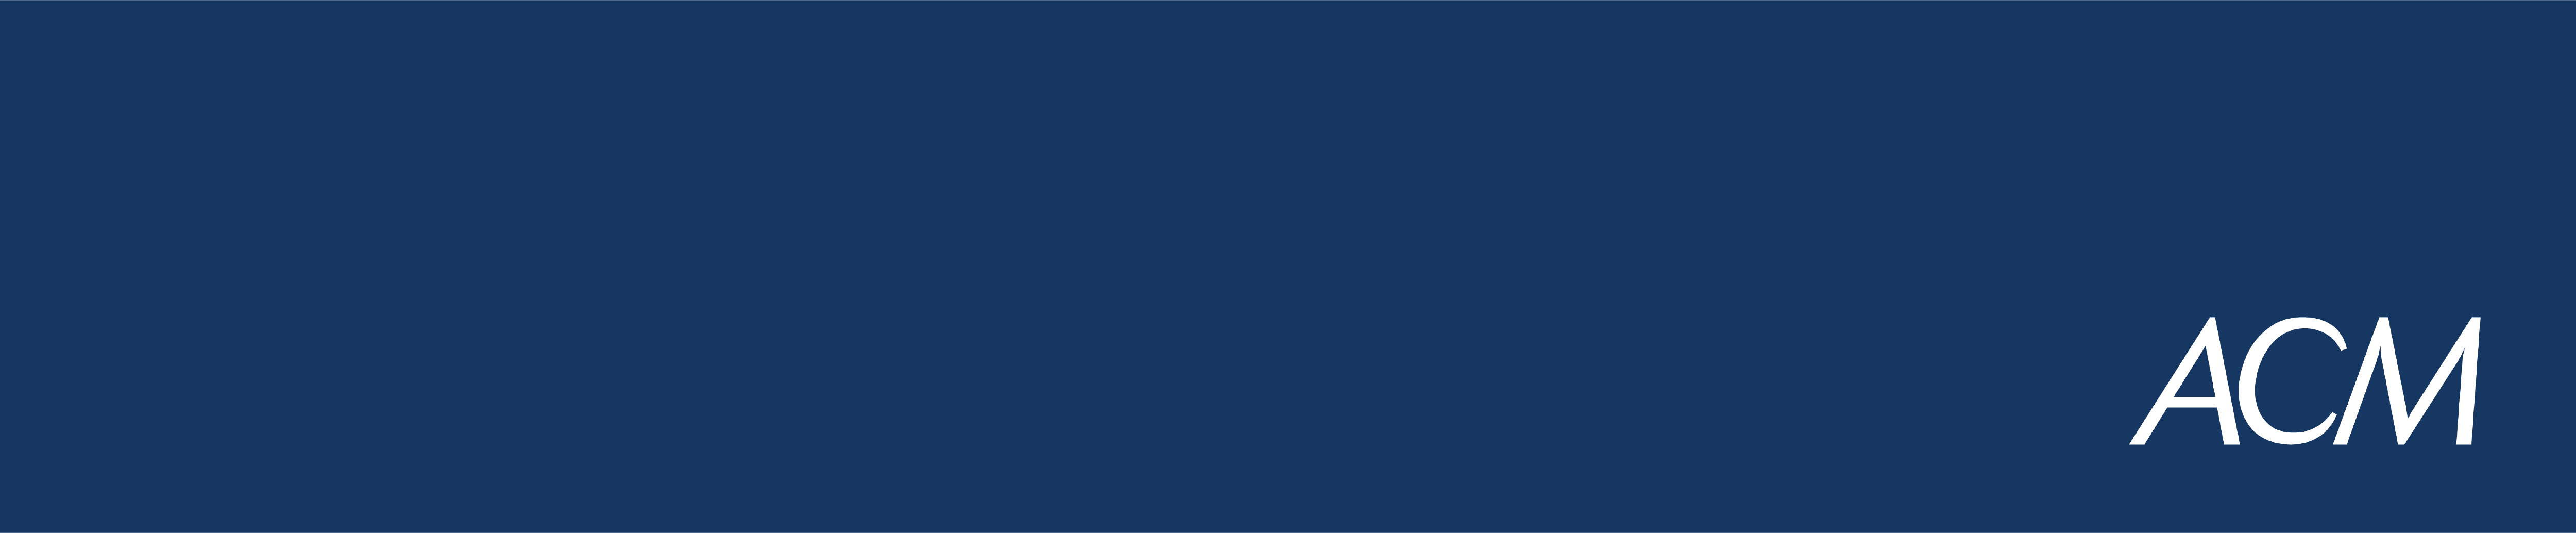 ACM Page Header Logo Banner_2-8